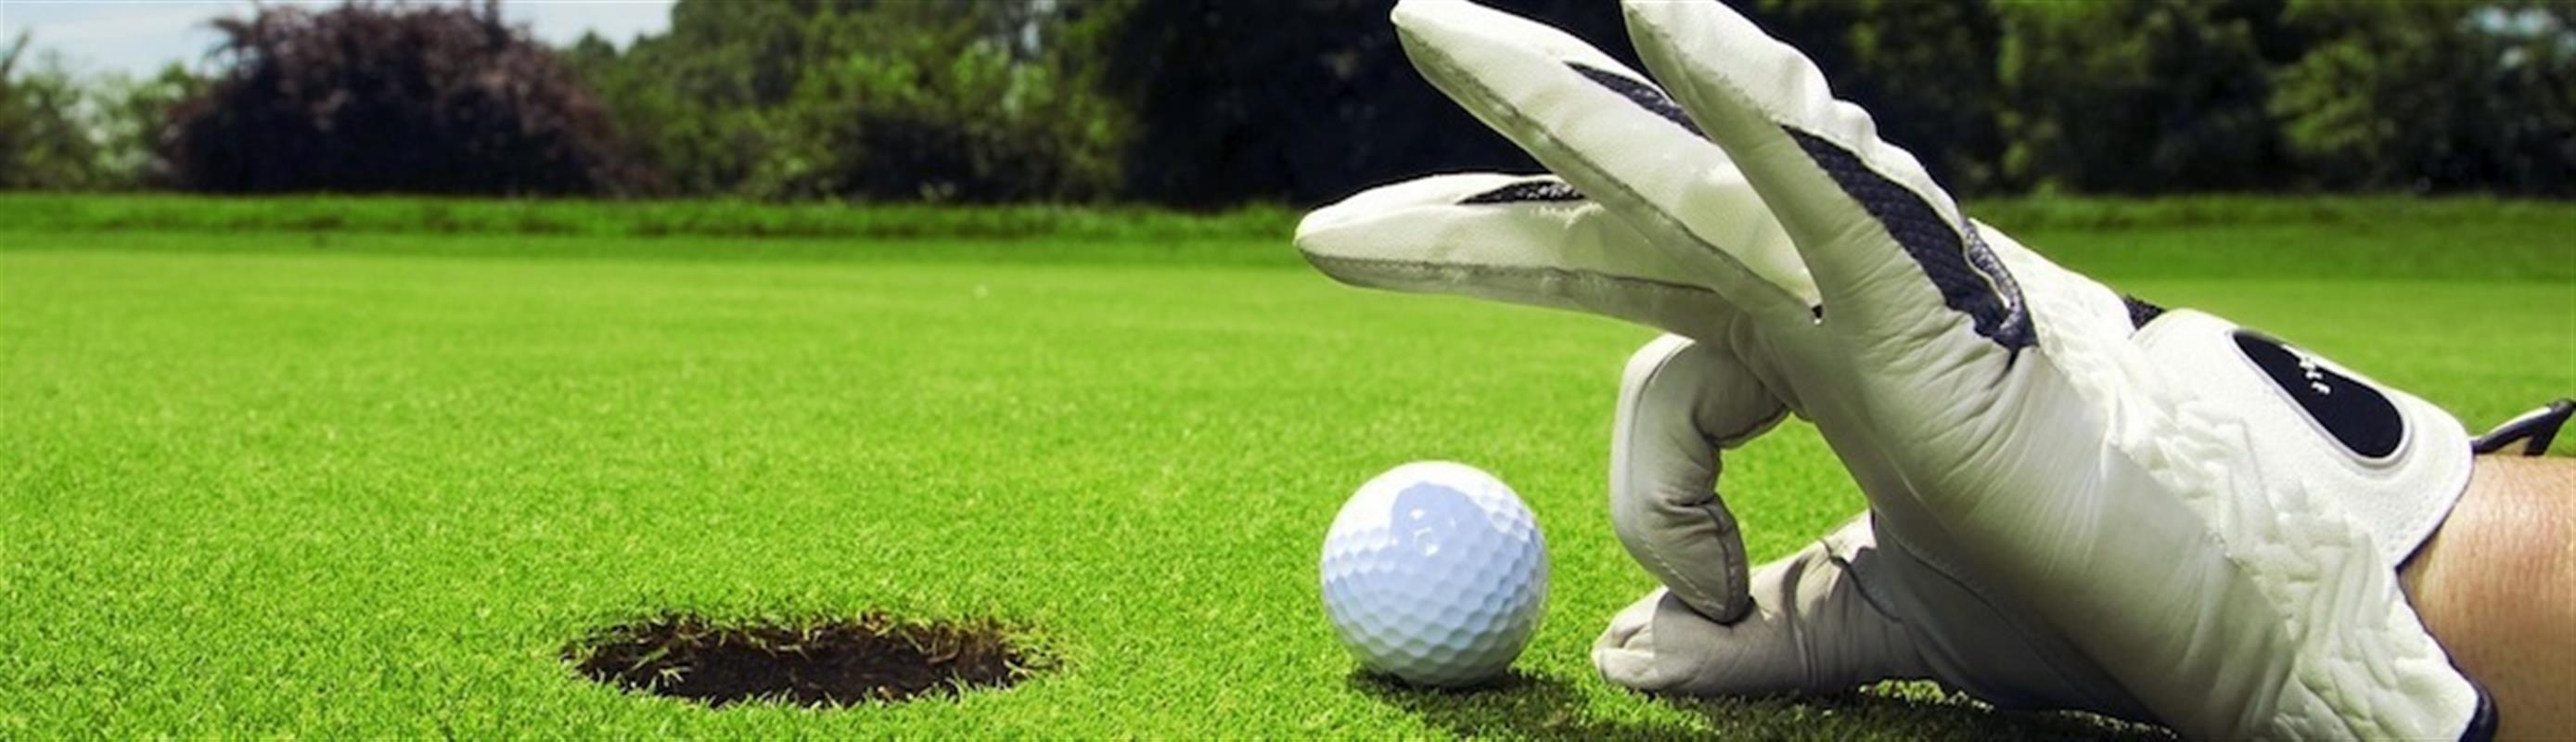 Golf de cabourg hotel du golf cabourg for Golf du bic forfait